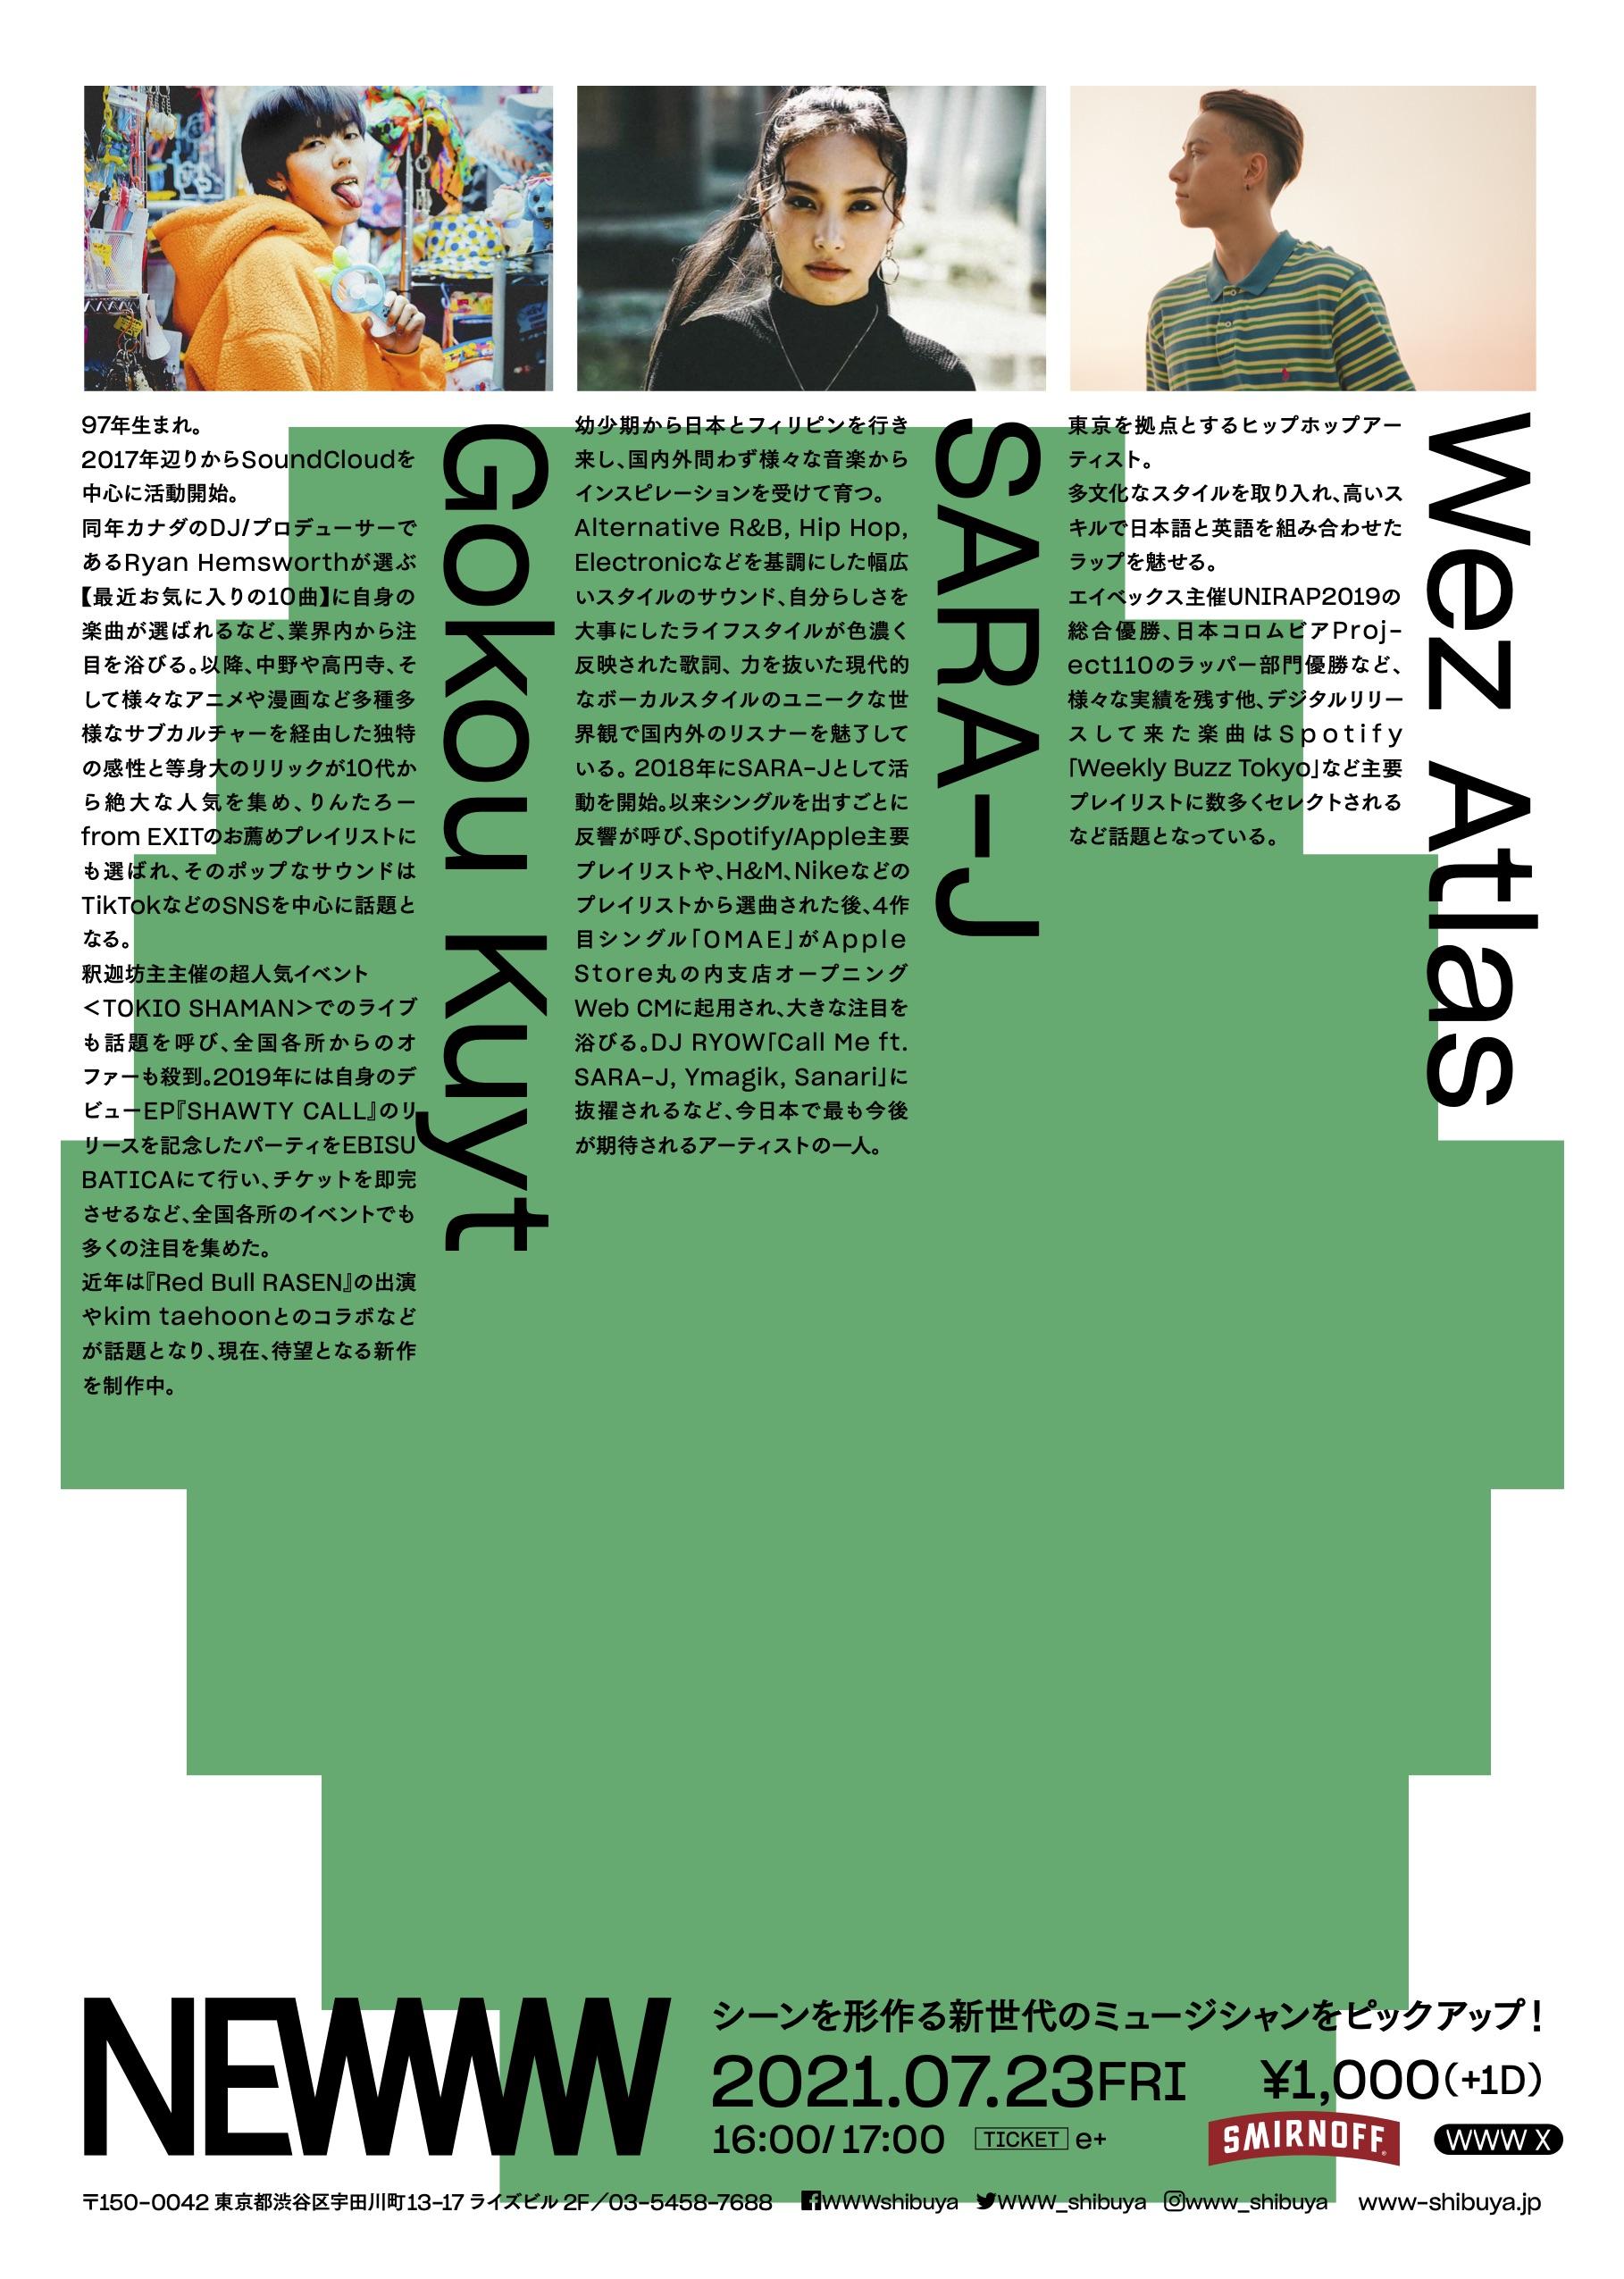 NEWWW_Flyer_0723_main.jpg